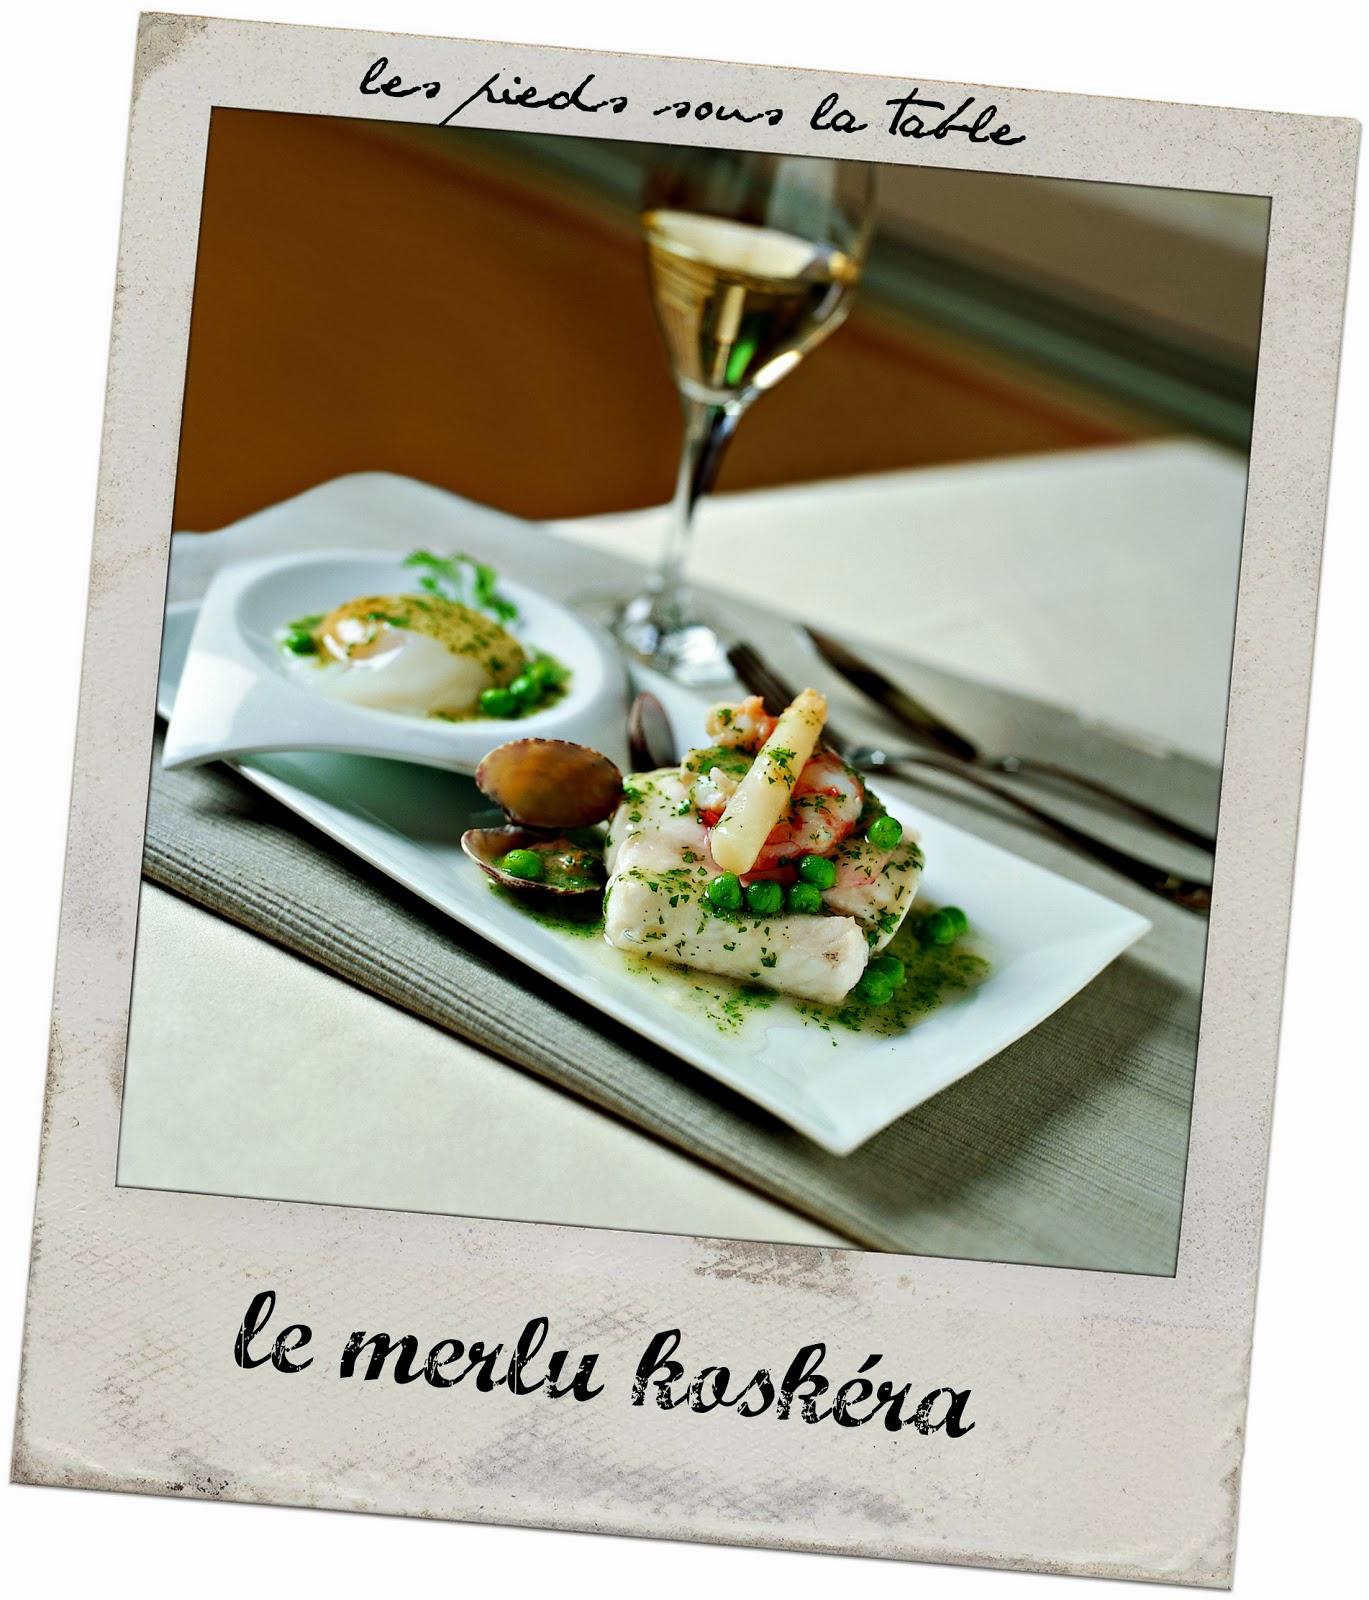 Le Merlu koskera plat du pays basque